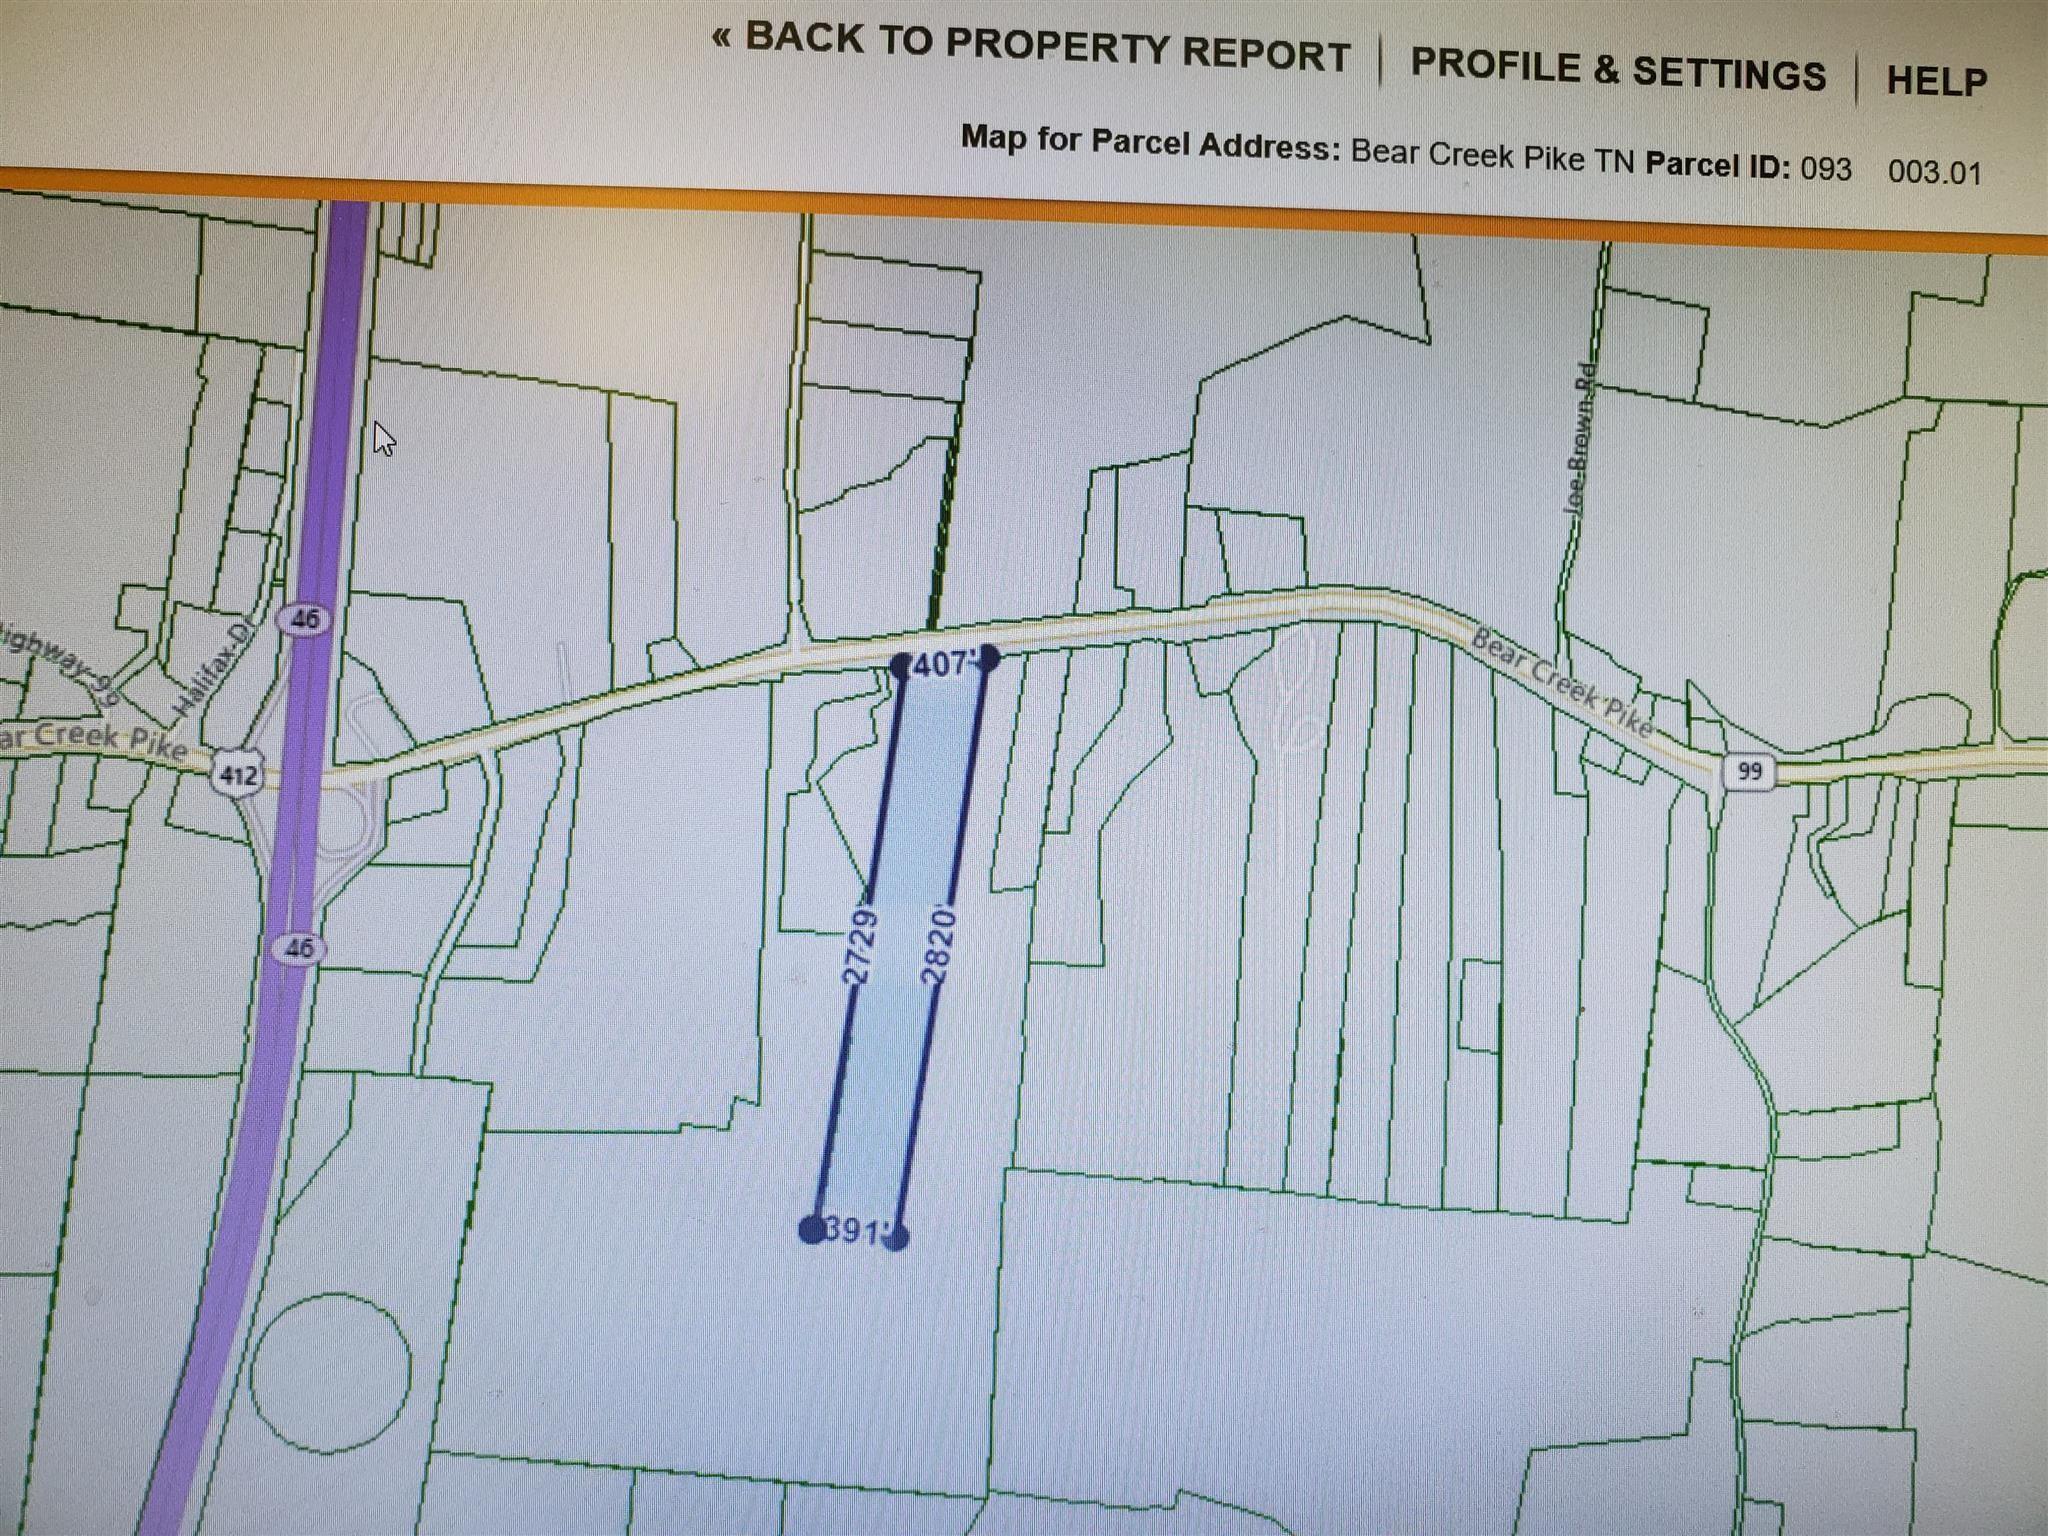 0 Bear Creek Pike - 25 Acres, Summertown, TN 38483 - Summertown, TN real estate listing